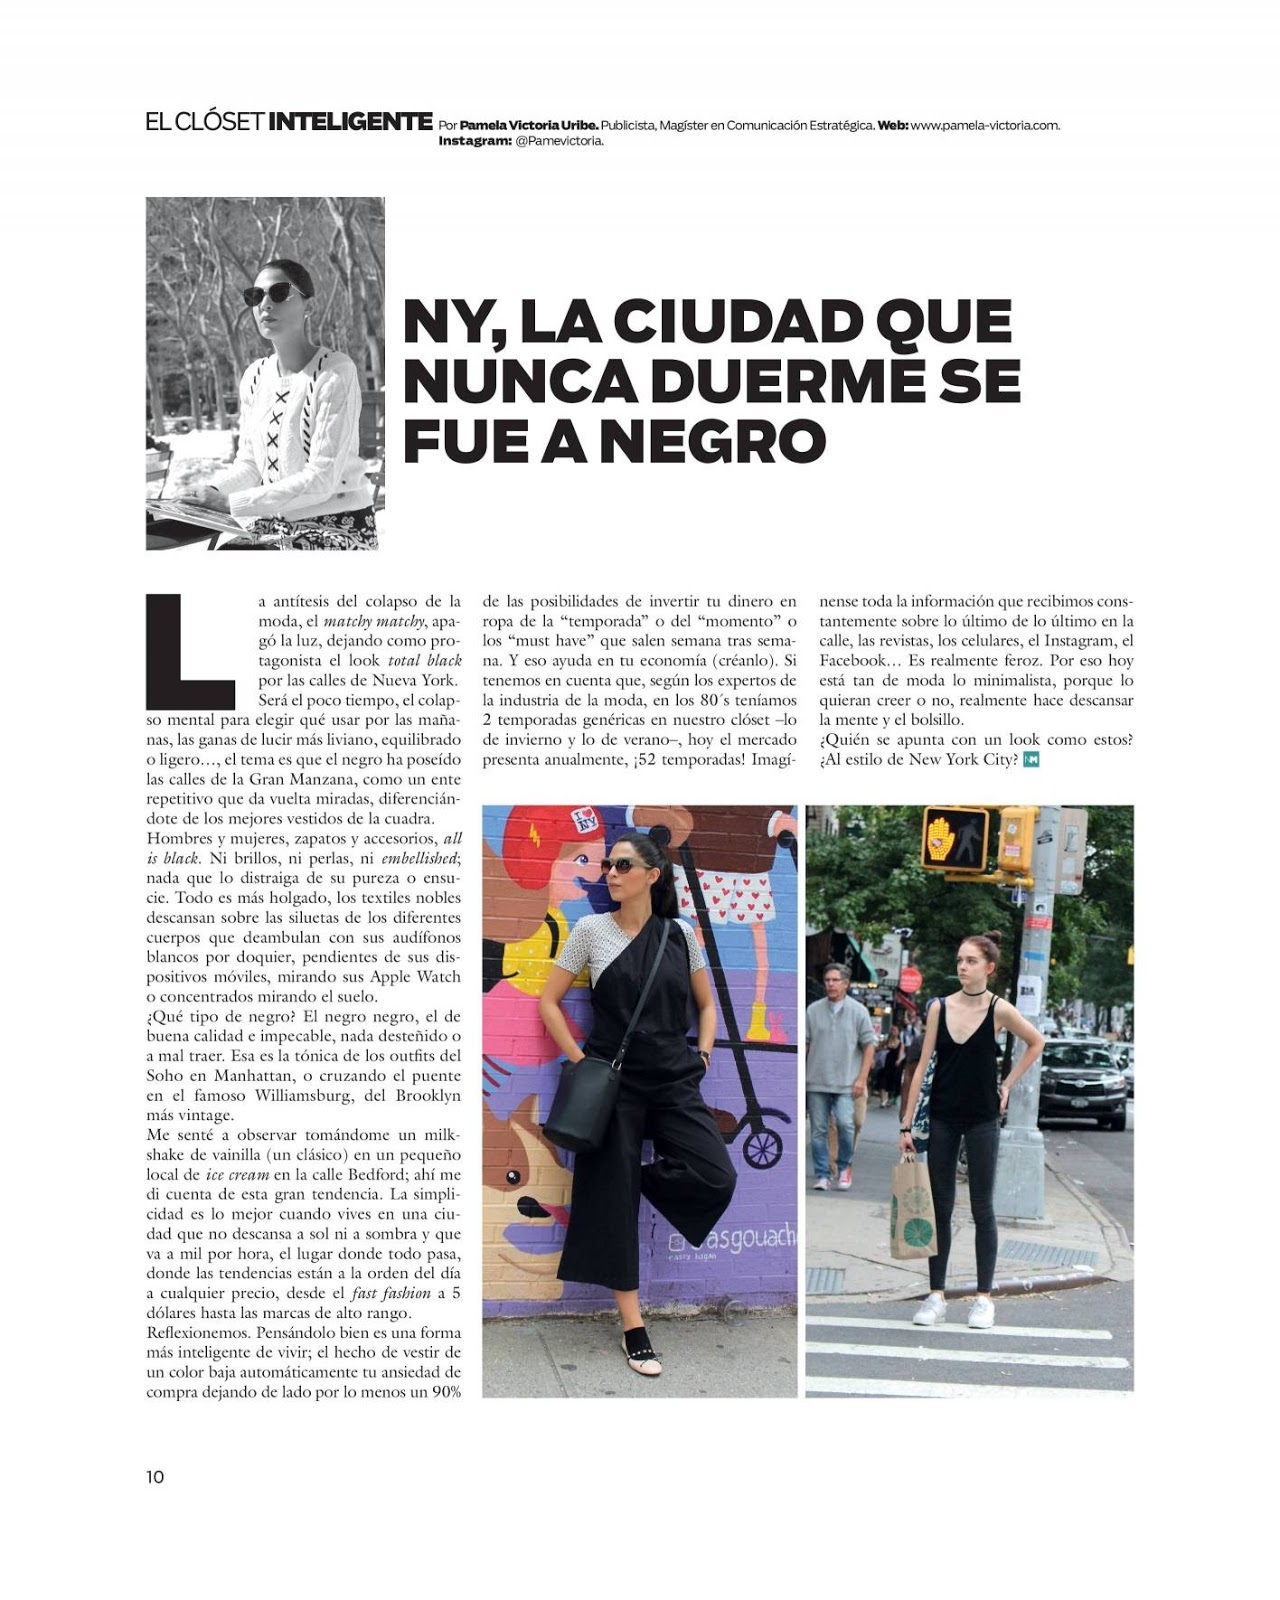 Pamela victoria - columnista de moda - experta en moda - columnista de medios chilenos - fashion columnist -